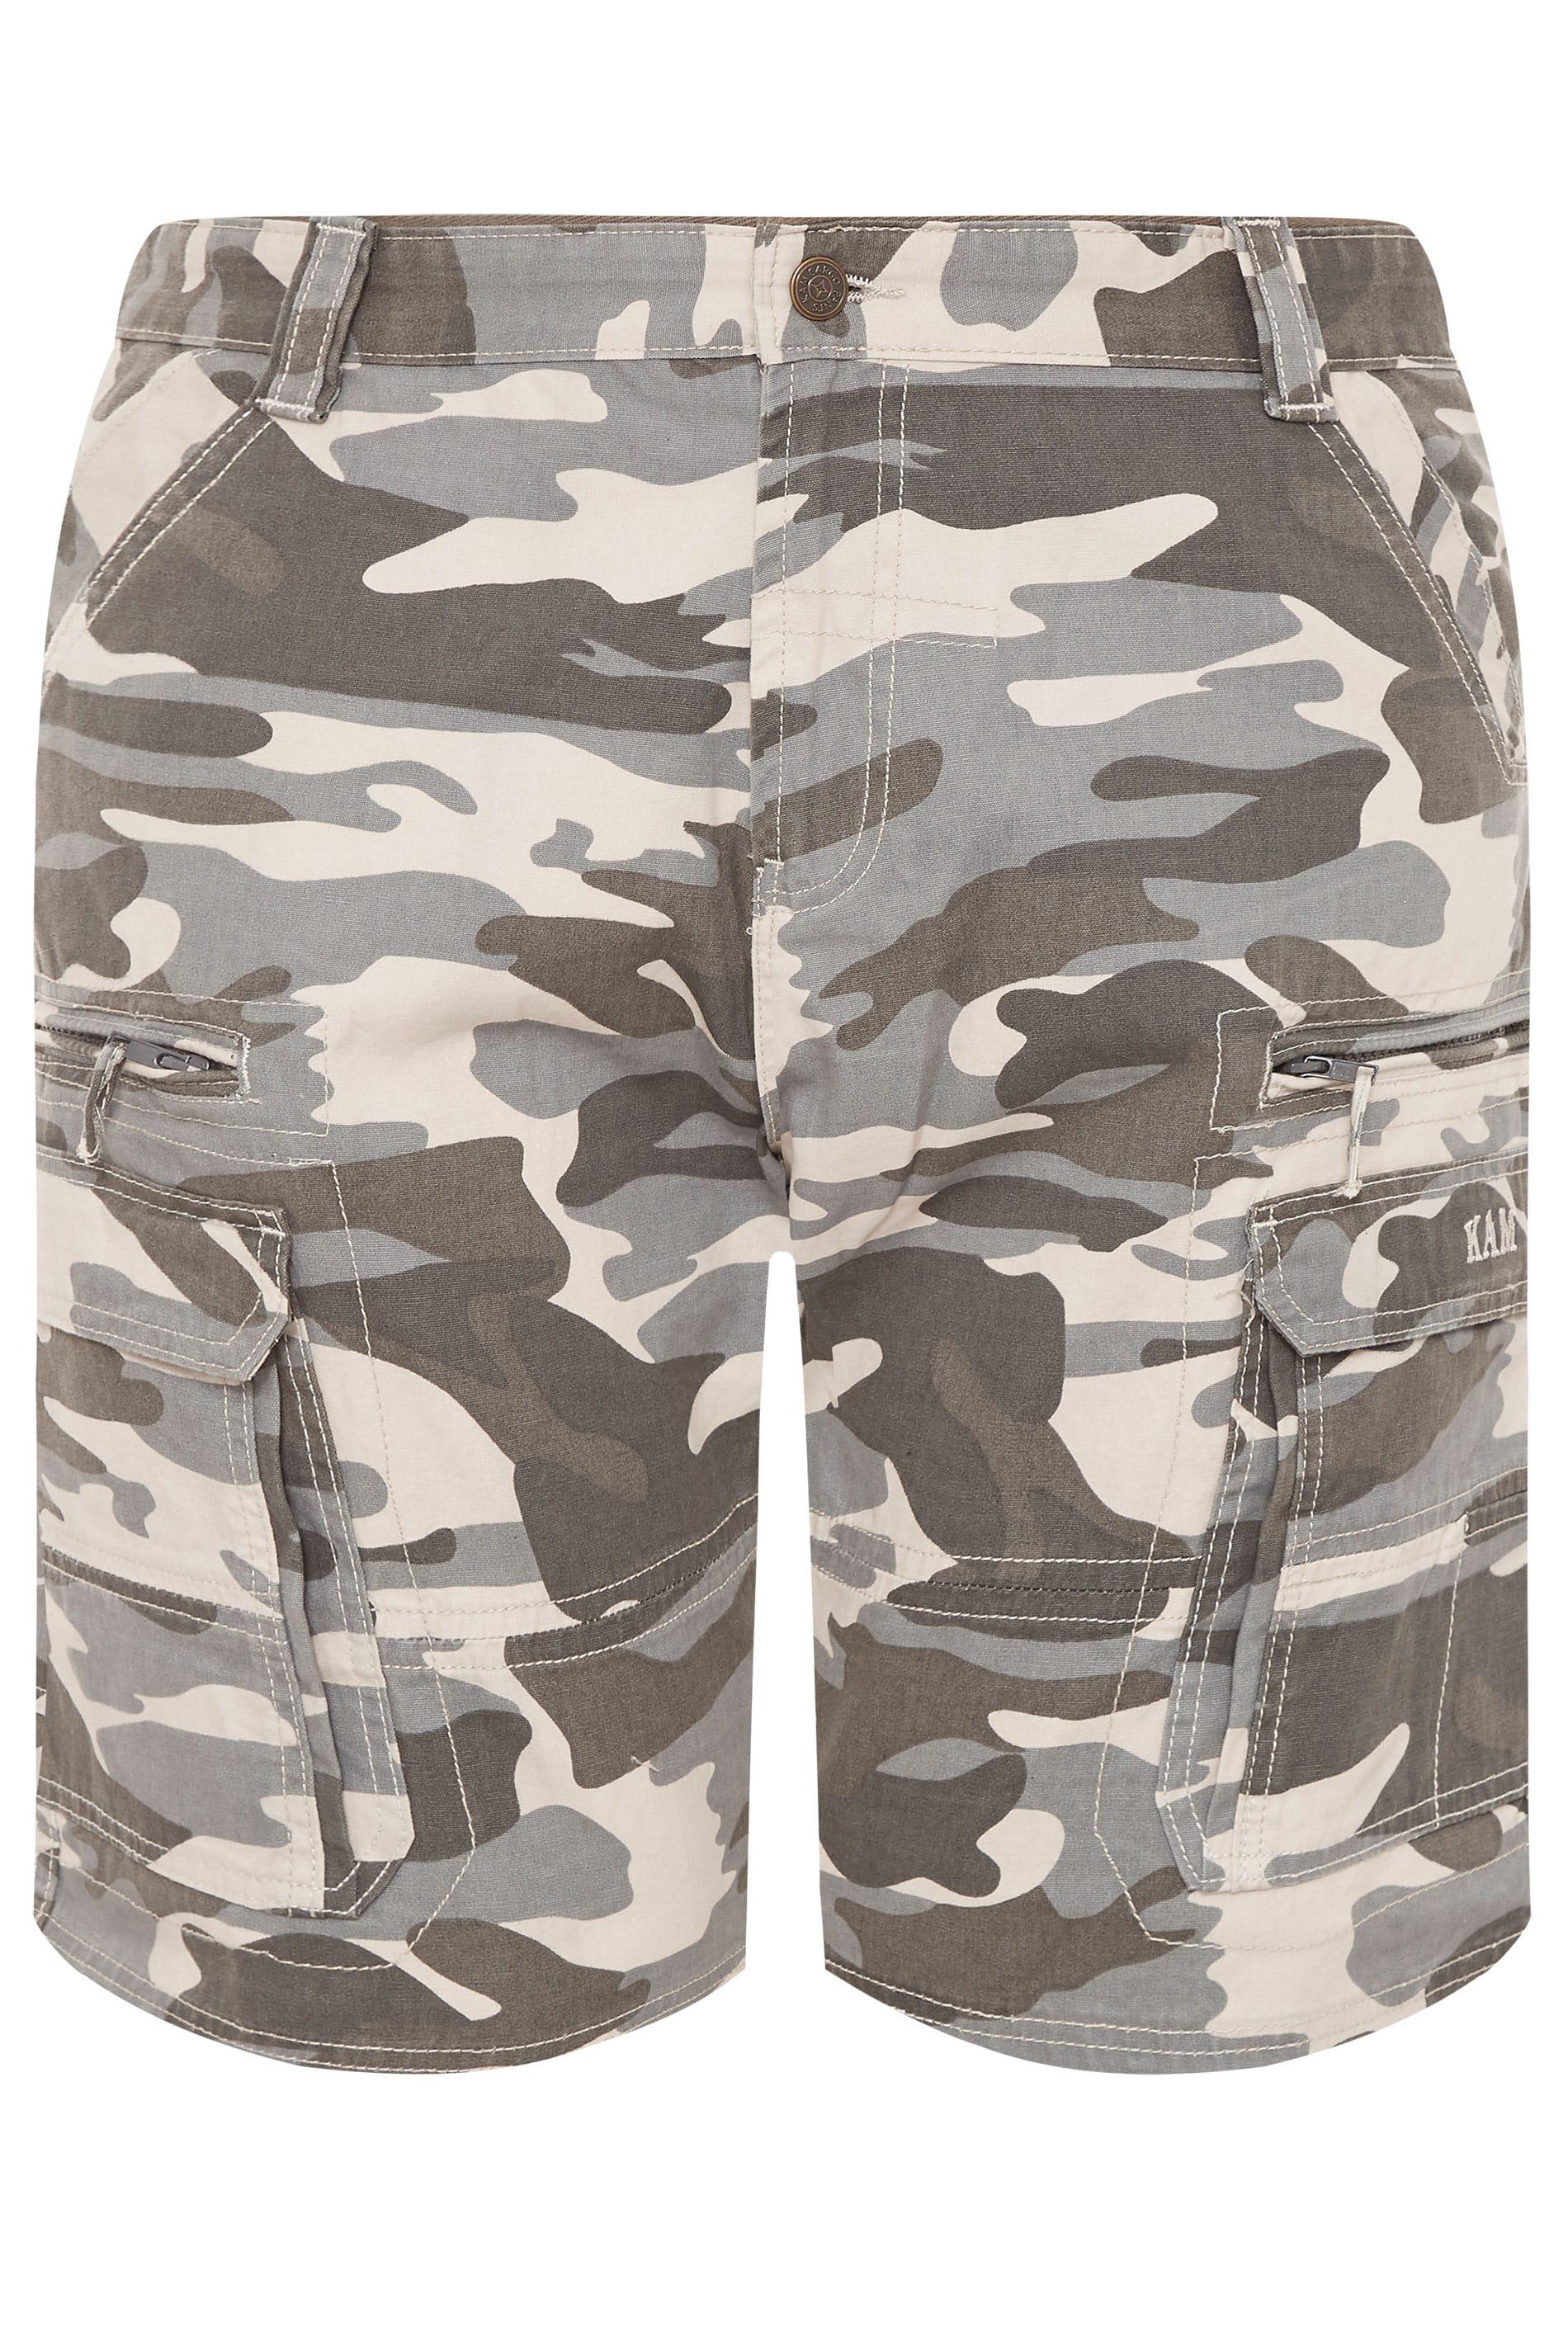 KAM Charcoal Grey Camo Cargo Shorts